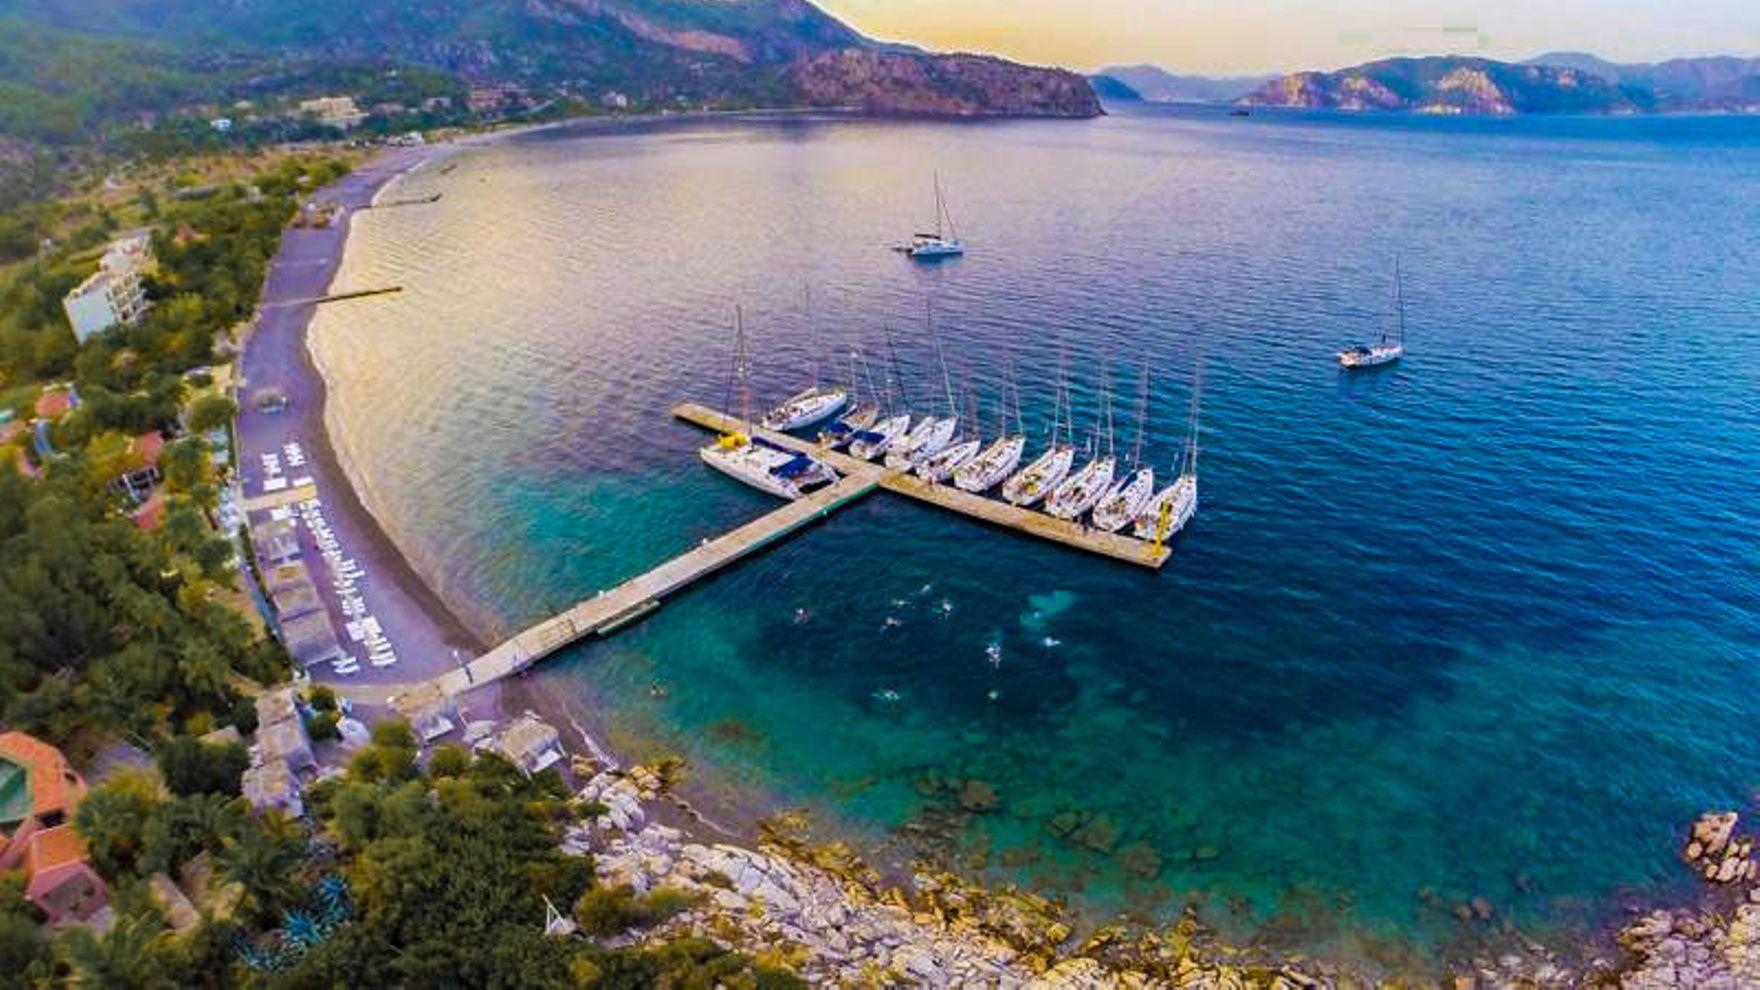 Круиз по Турецкому Средиземноморью